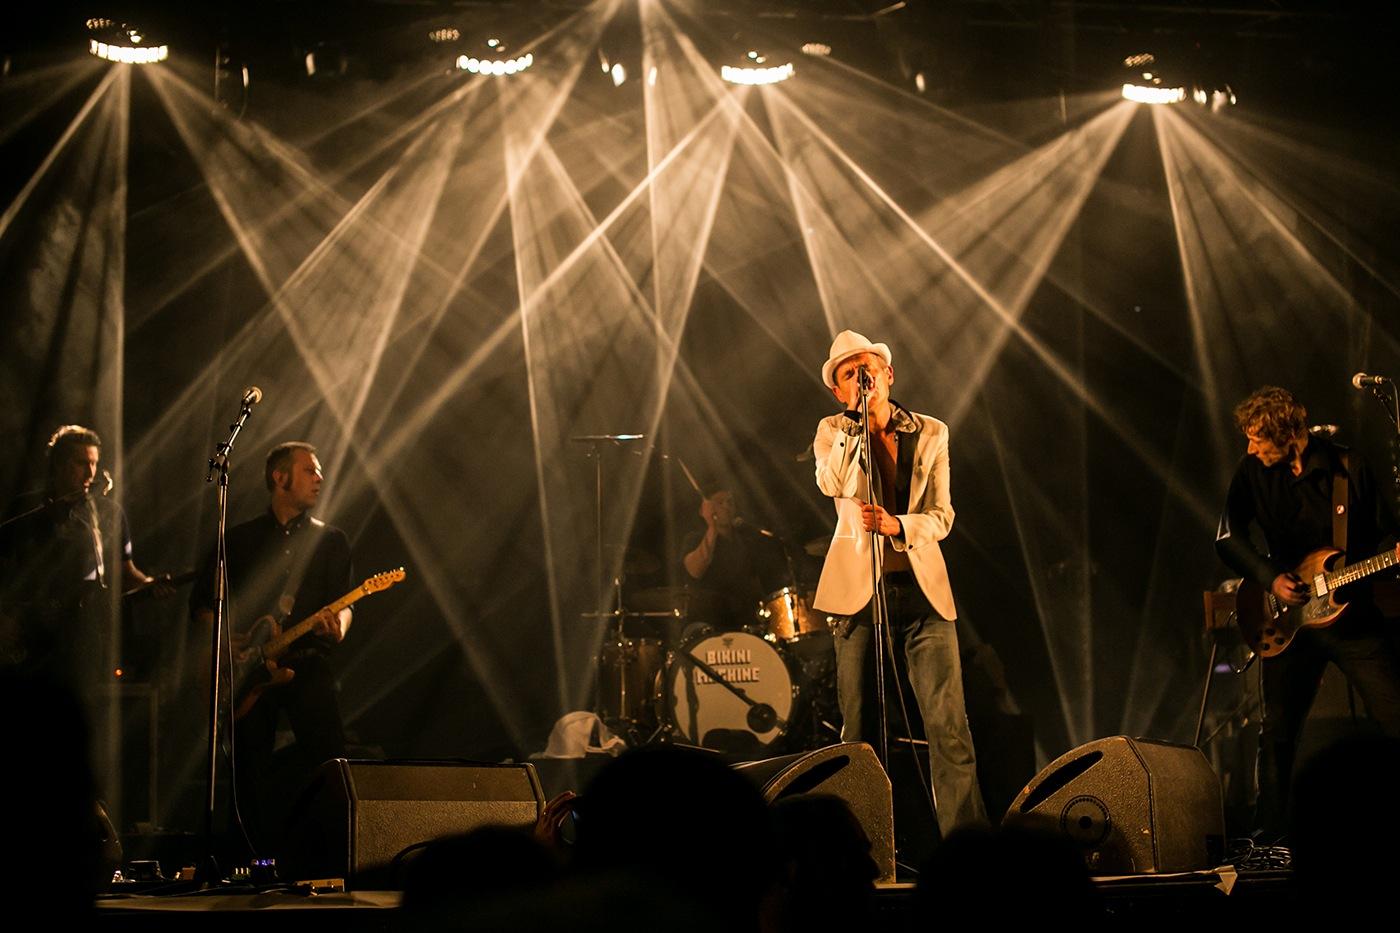 photographe-reportage-festival-rockadel-guillaume-heraud-047-small